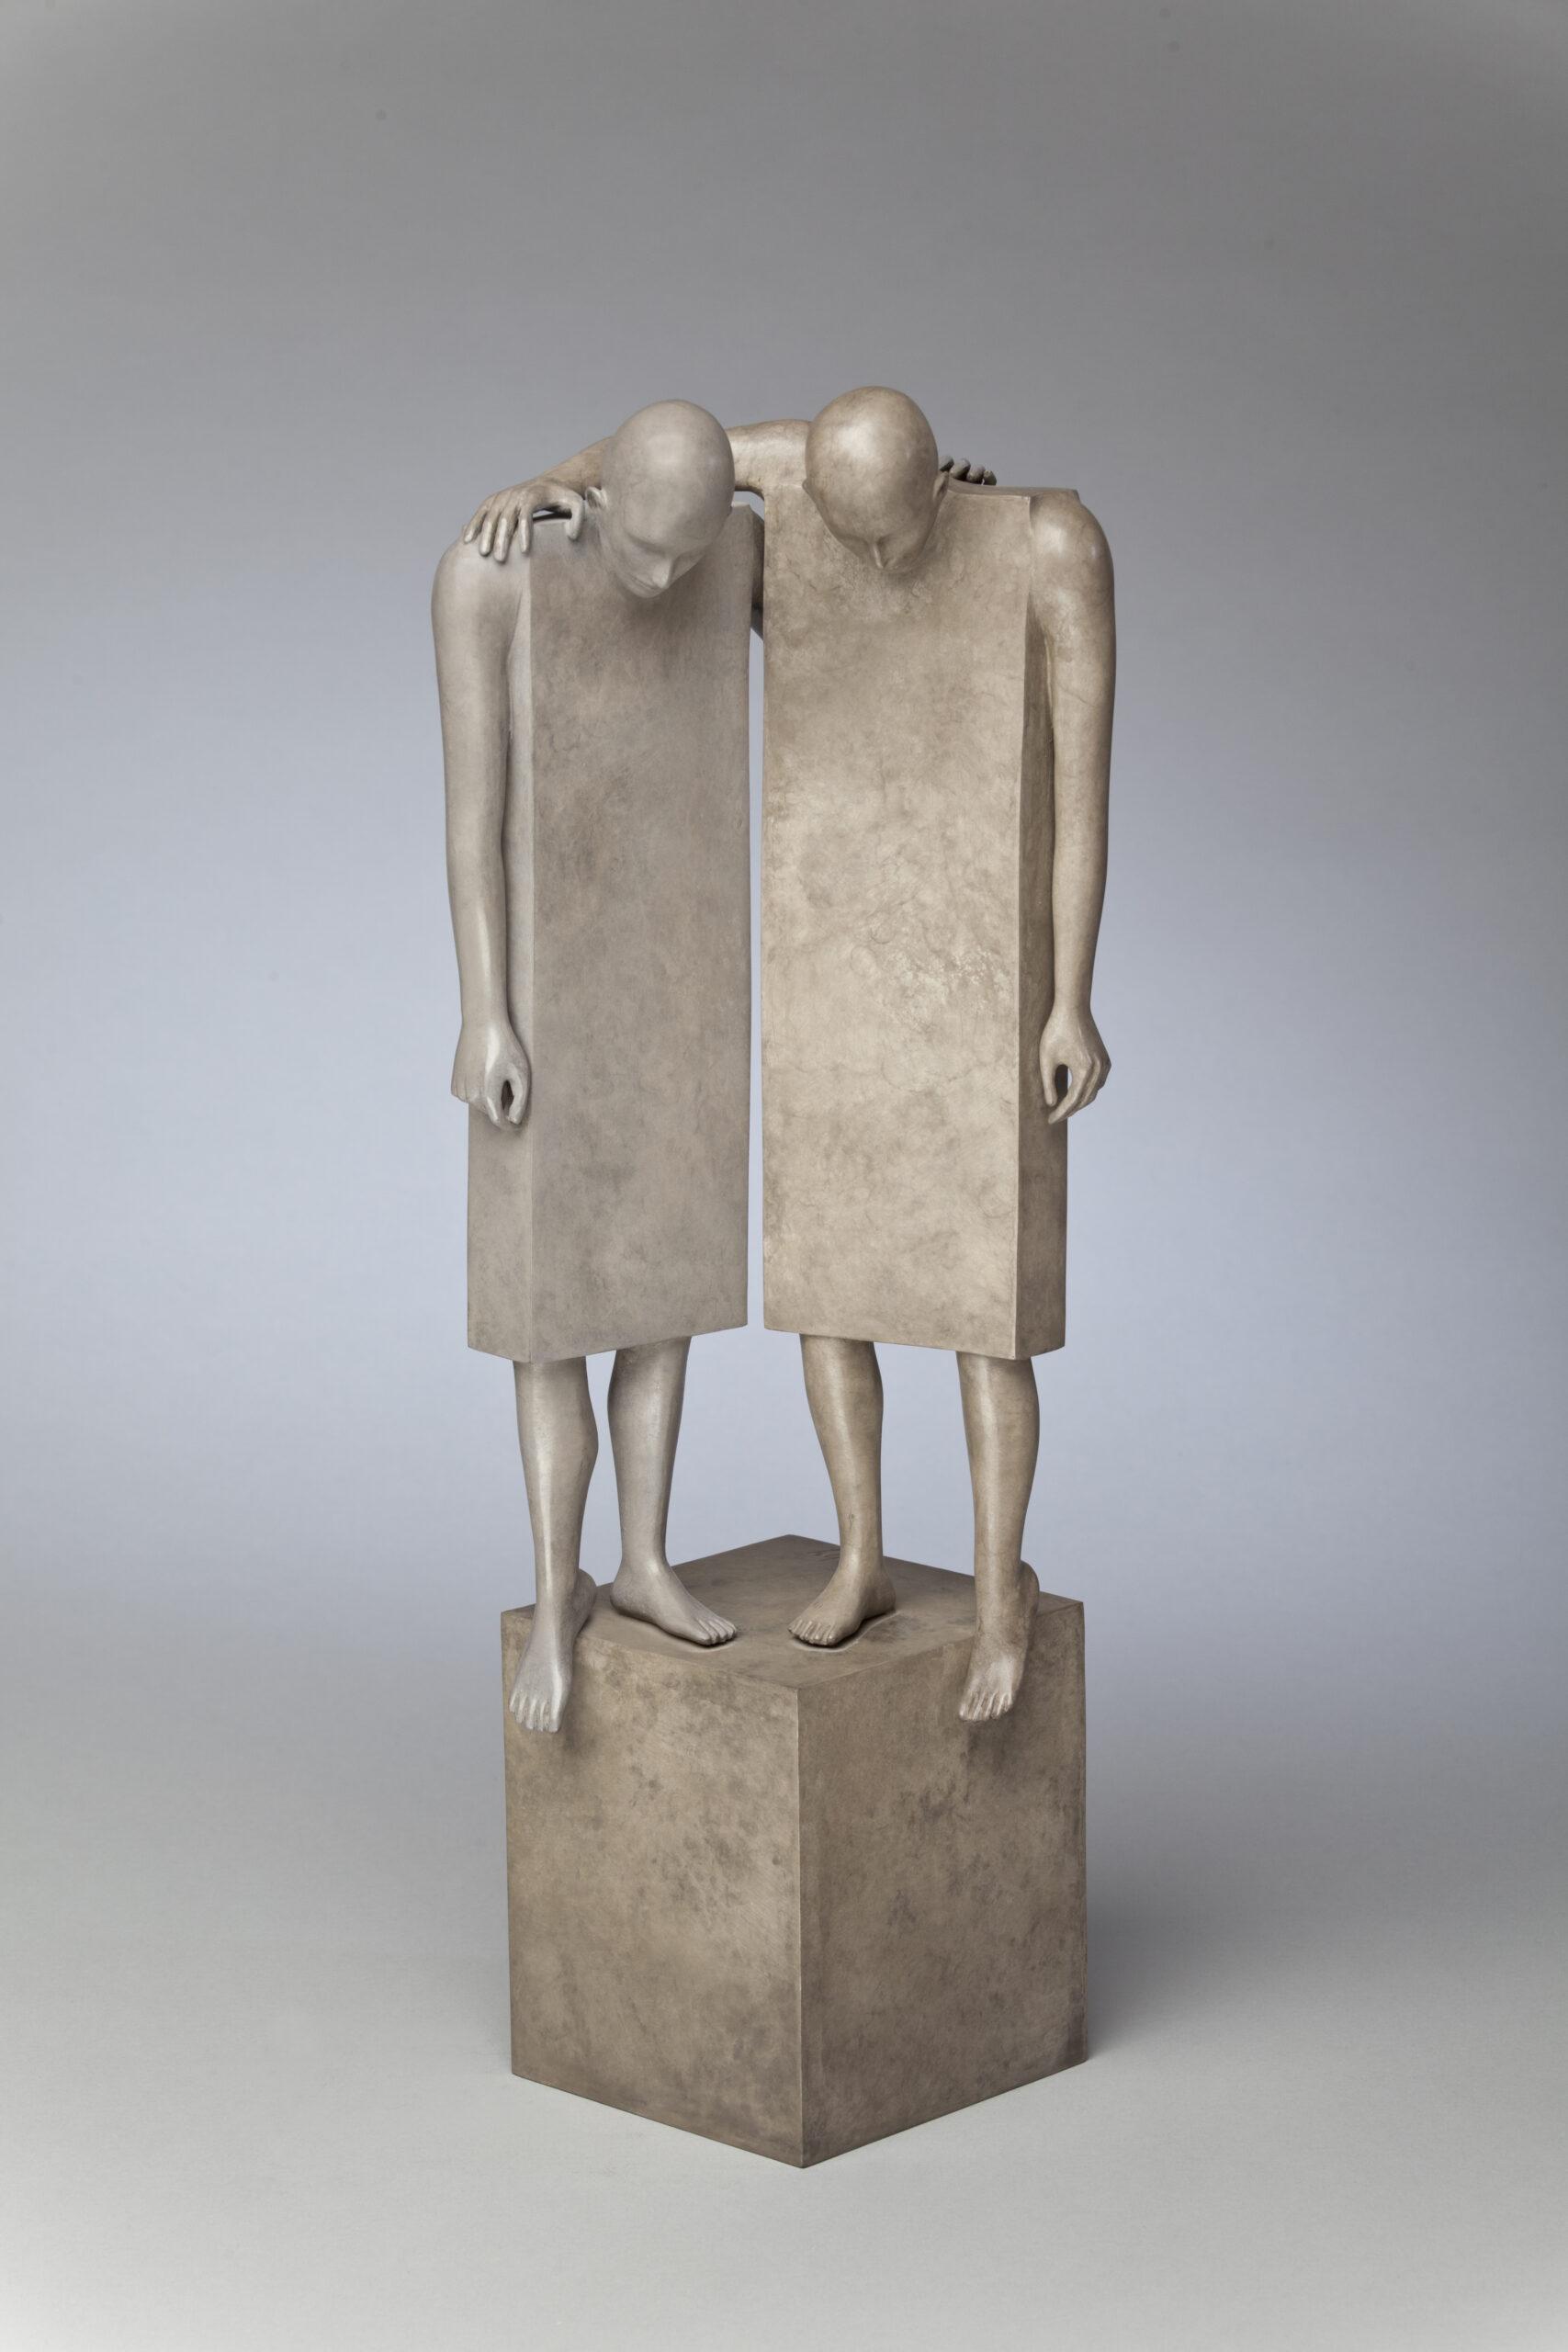 Corby - sculpture - Grands Projets - © Casart